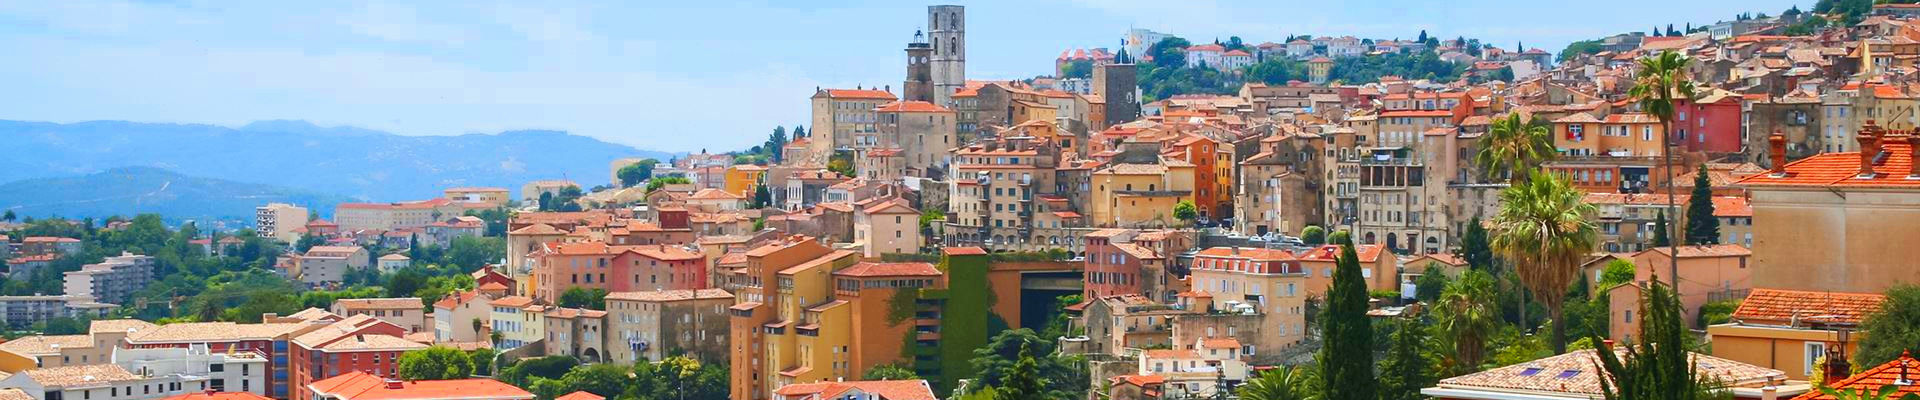 Frenchsoaps Grasse Panorama.jpg